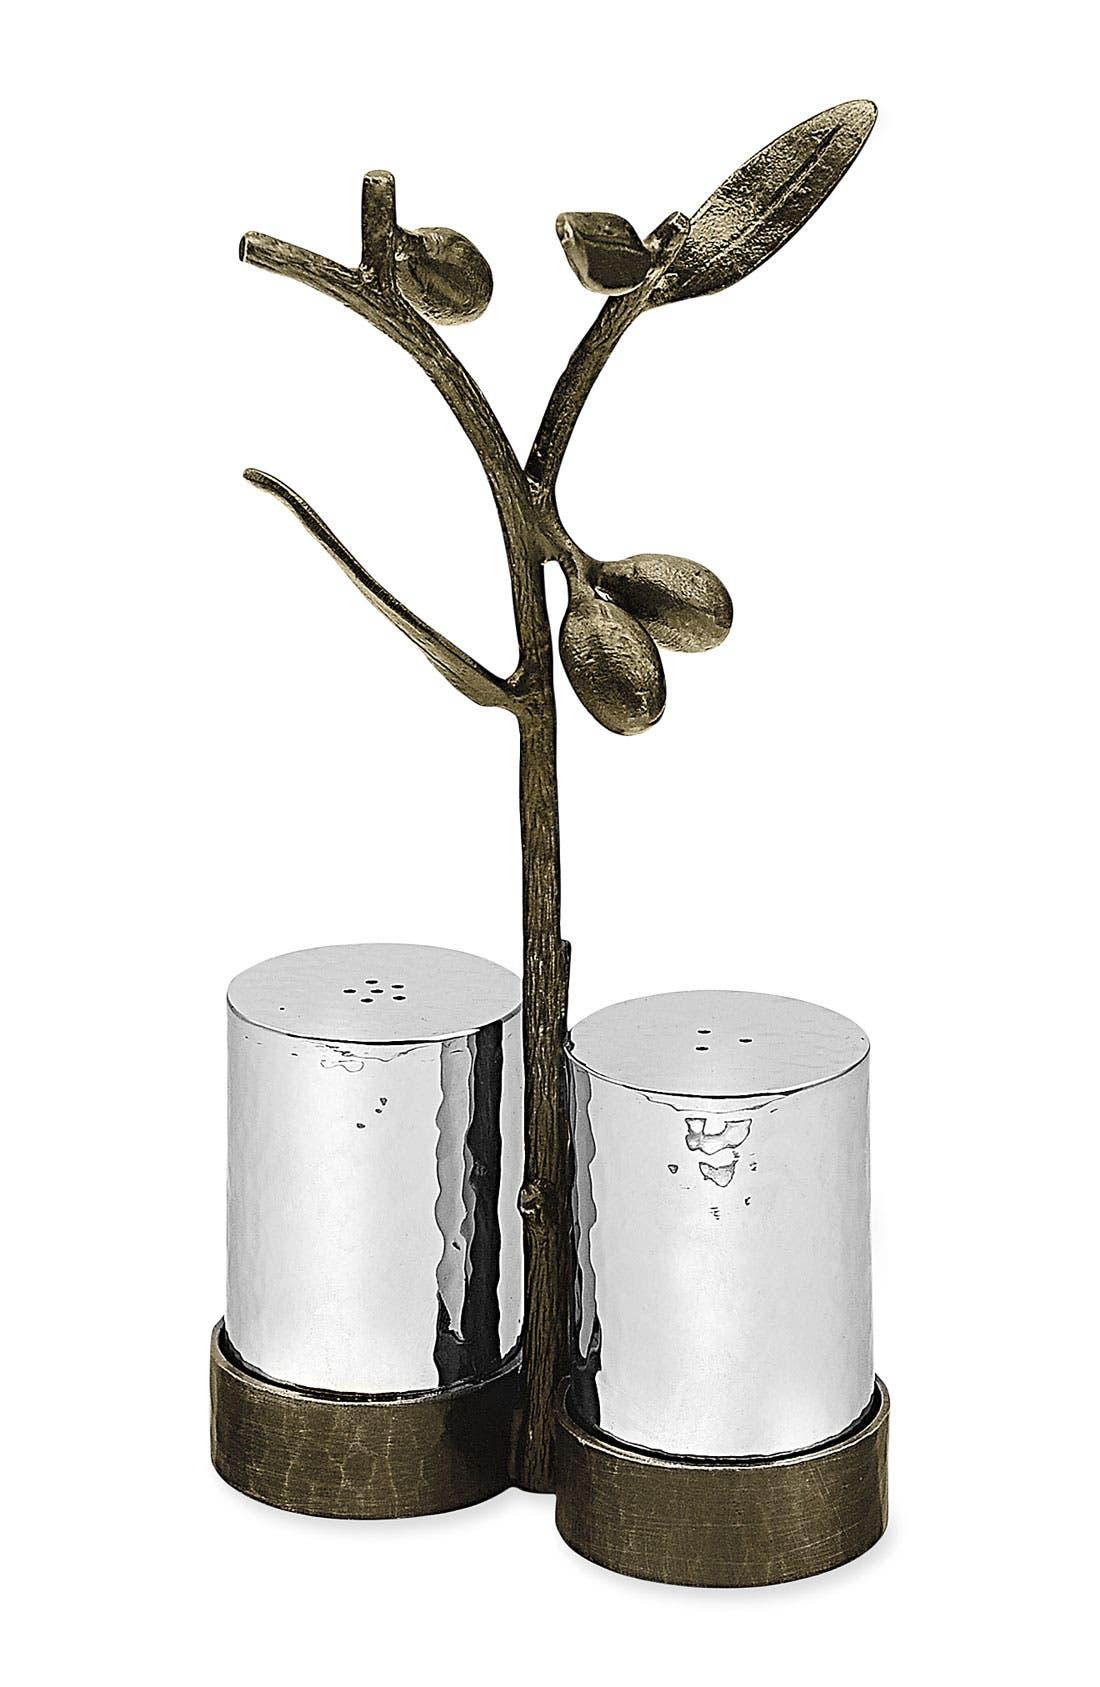 Alternate Image 1 Selected - Michael Aram 'Olive Branch' Salt & Pepper Caddy